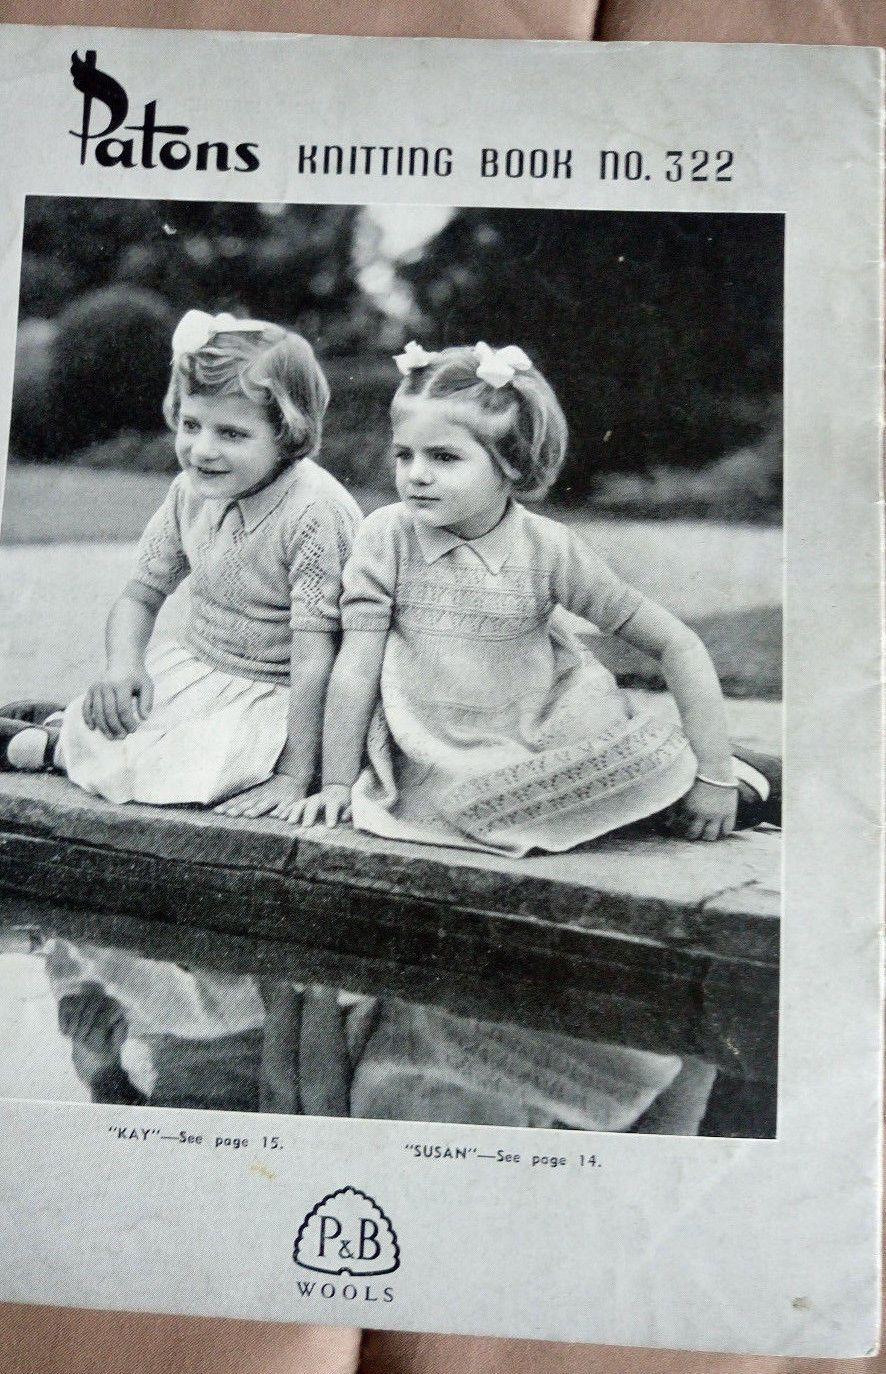 65b84890651e Children s Patons vintage knitting pattern book   322 • AUD 4.99 - PicClick  AU